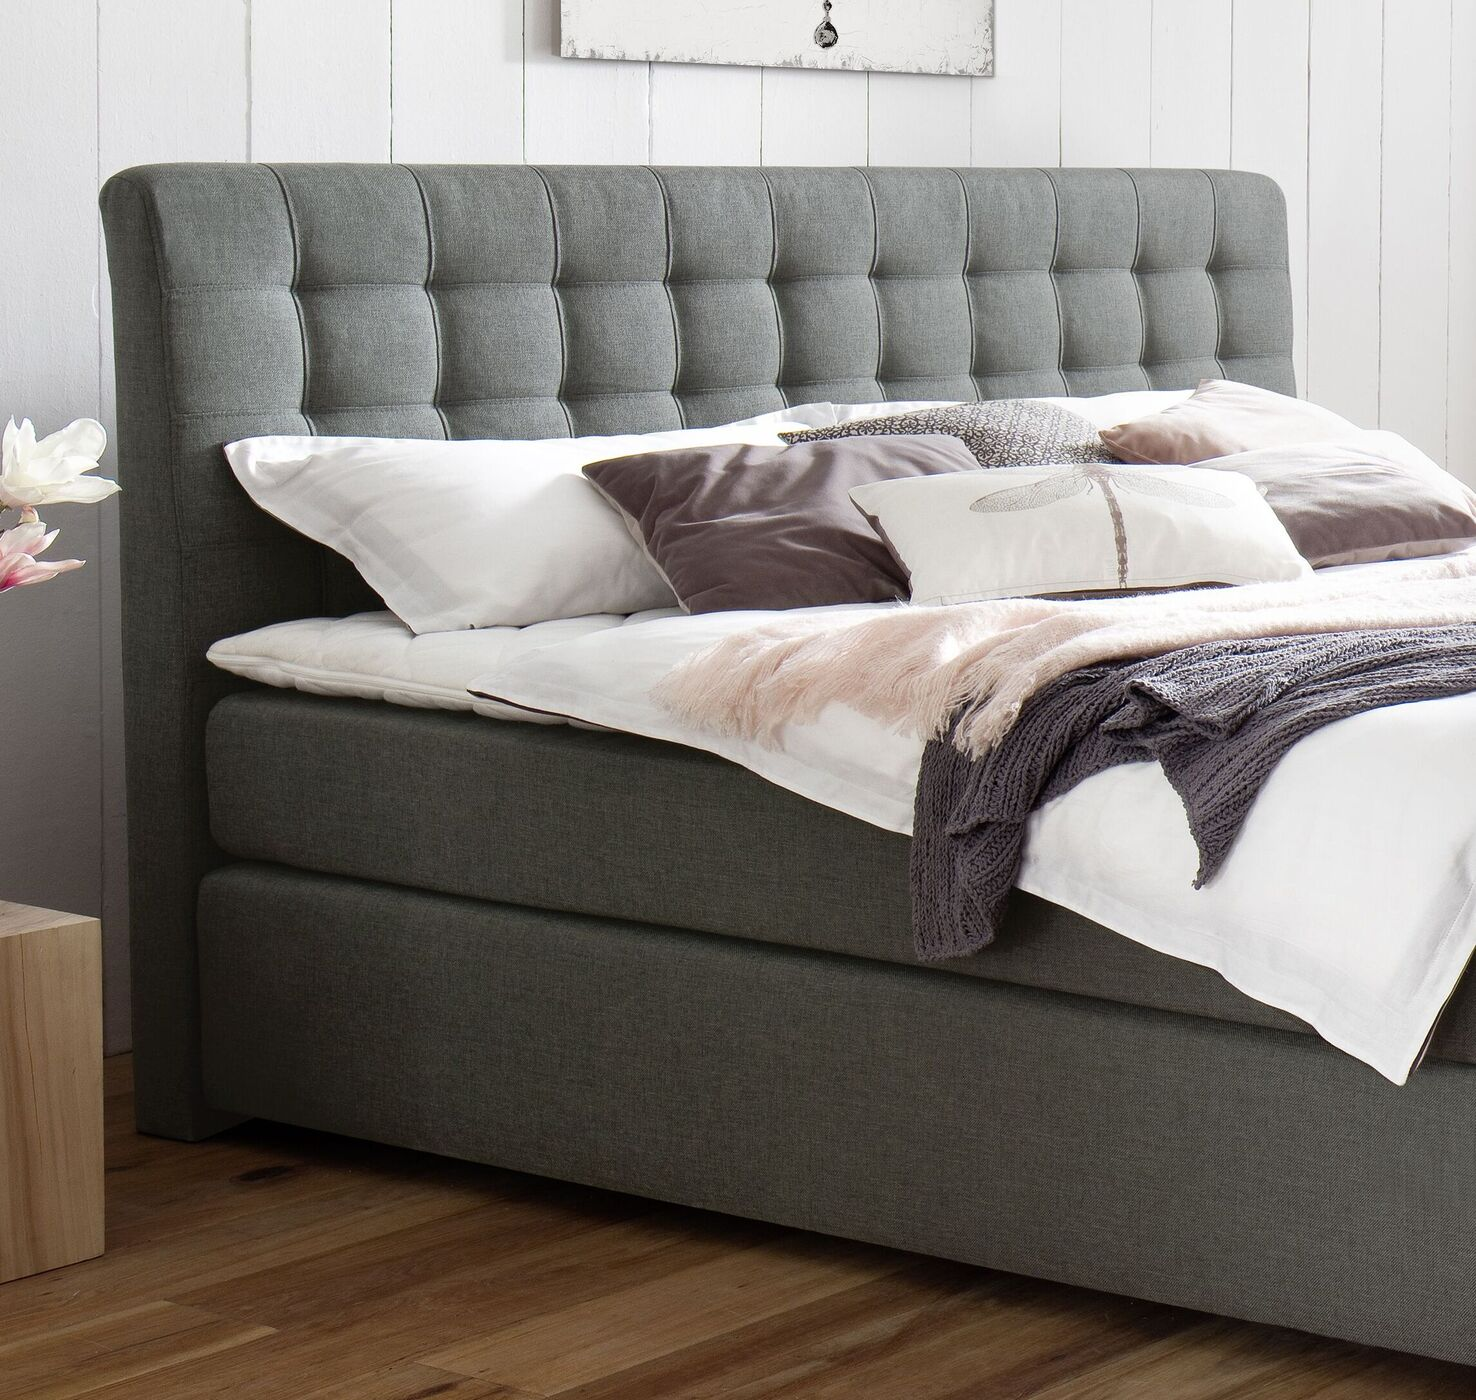 elegantes boxspringbett mit webstoff z b in h3 bis 120 kg matai. Black Bedroom Furniture Sets. Home Design Ideas